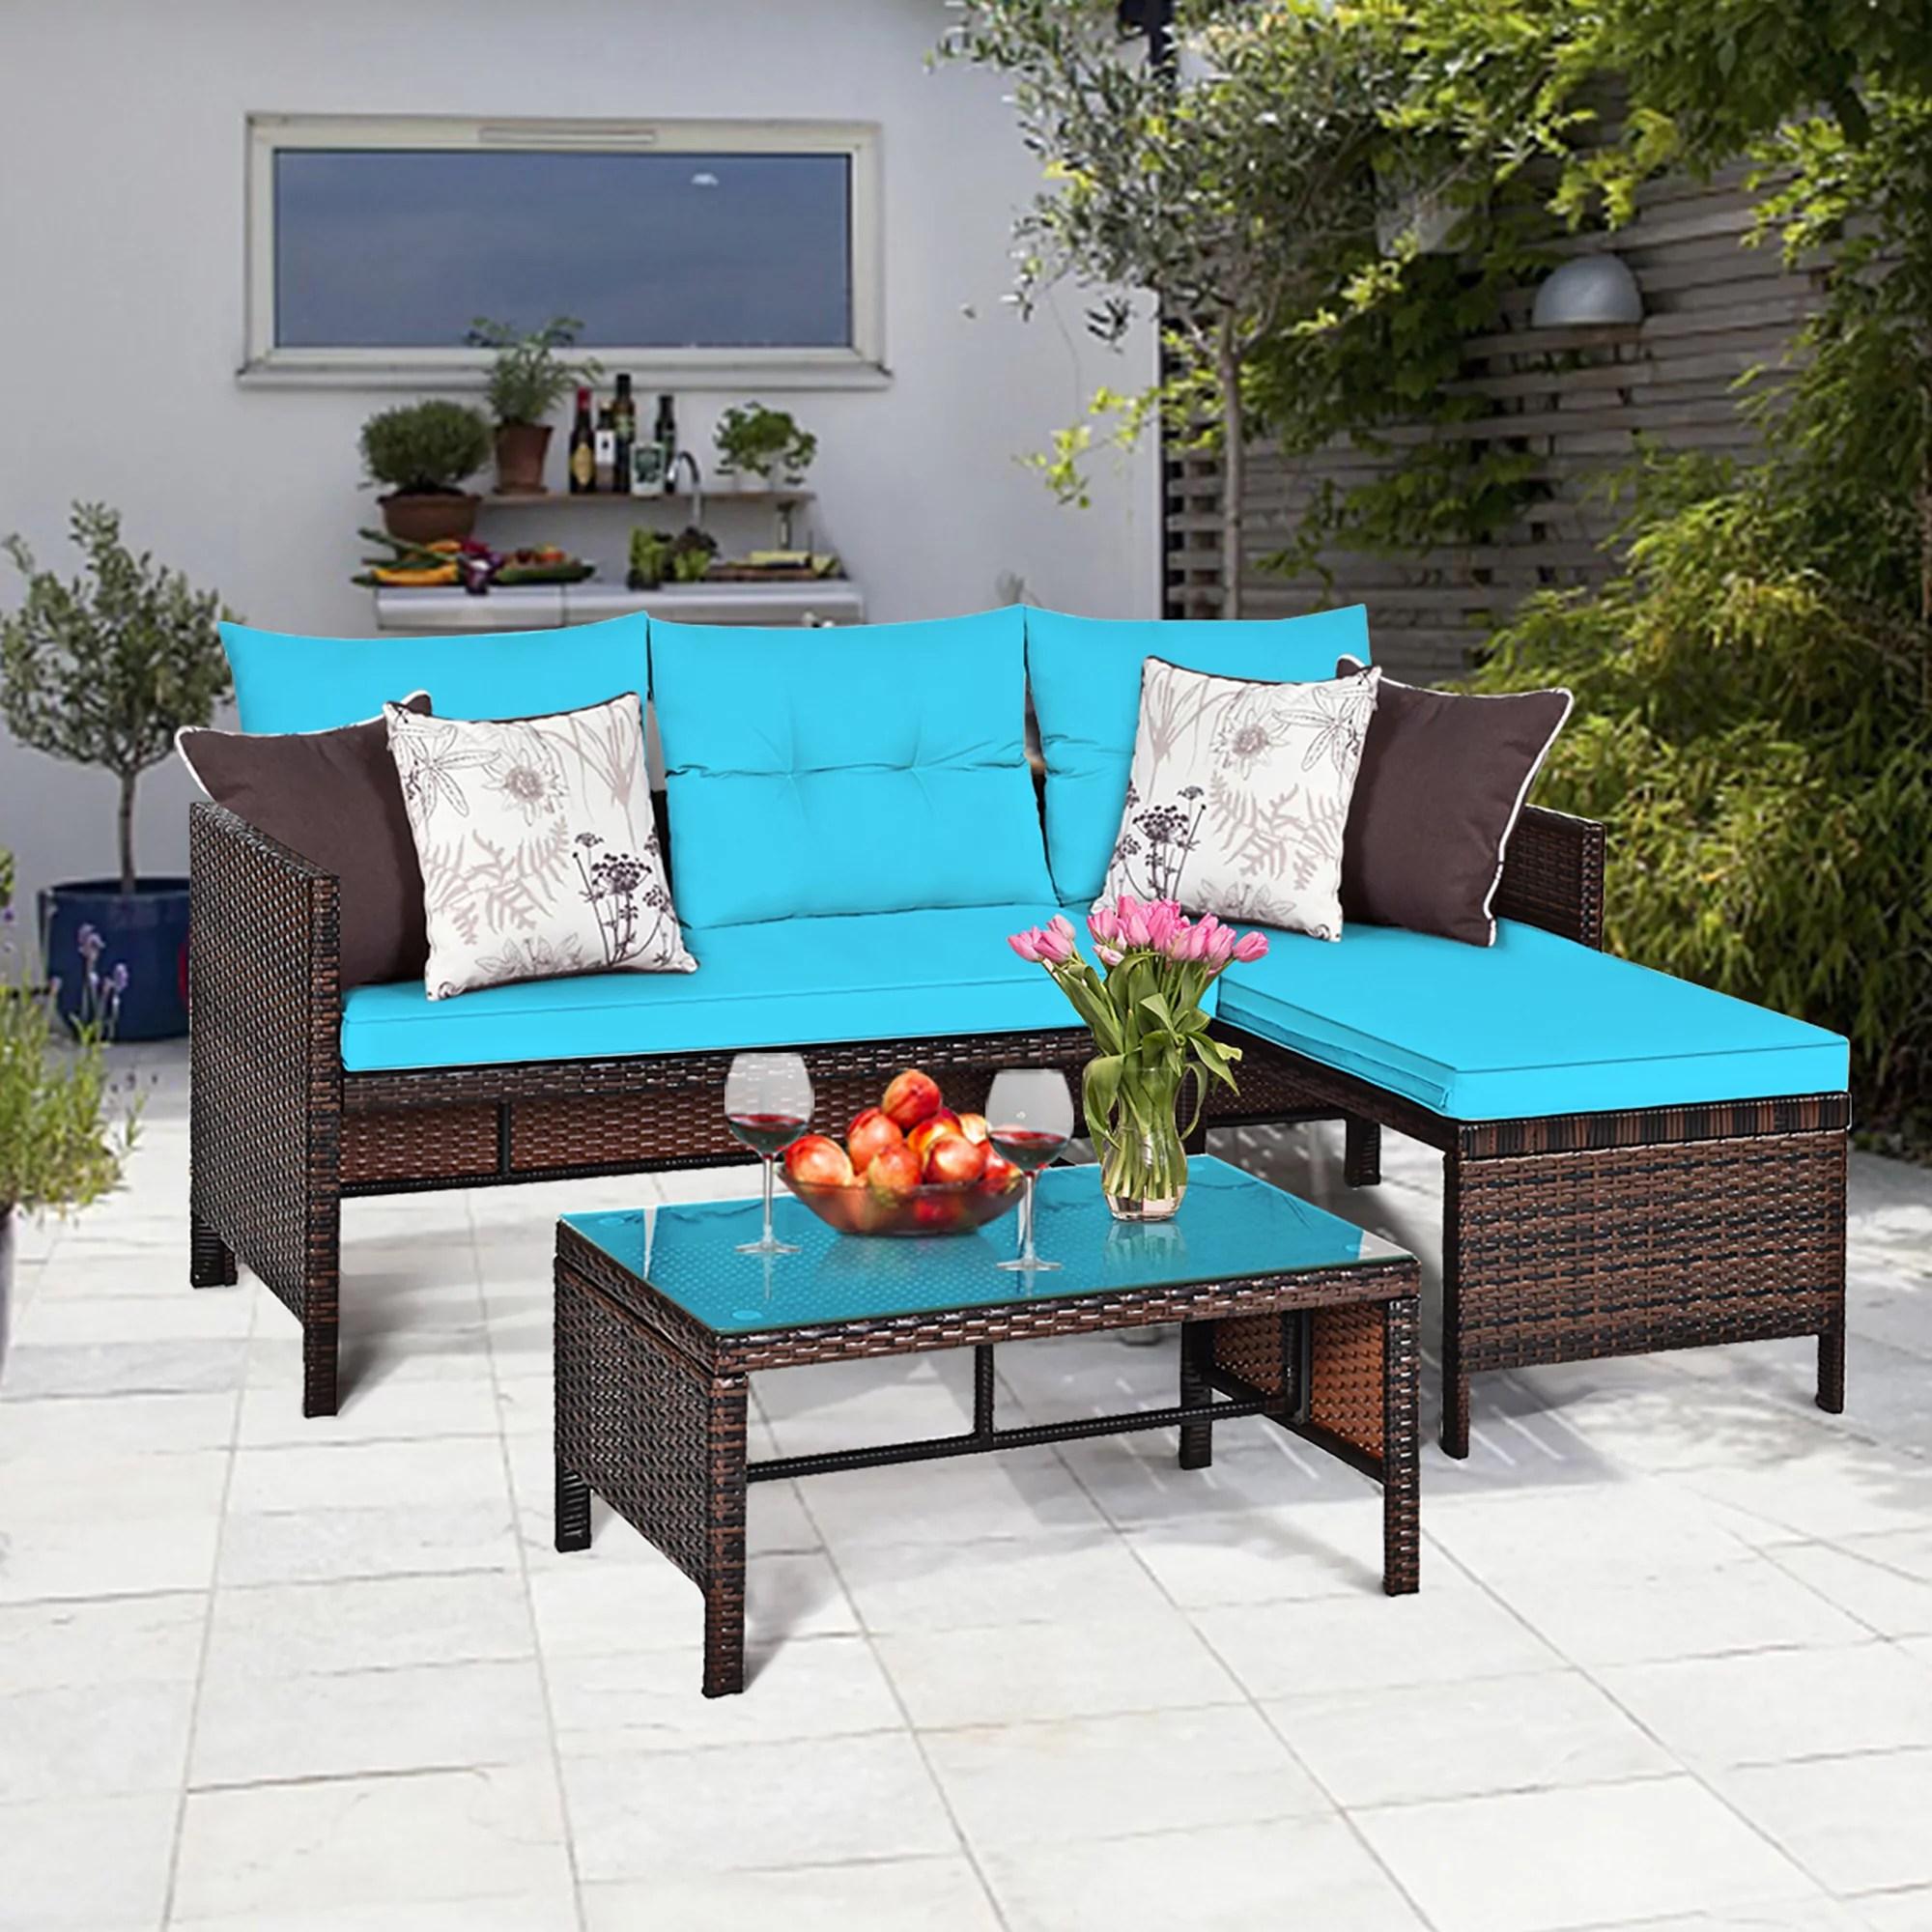 costway 3pcs patio wicker rattan sofa set outdoor sectional conversation set turquoise